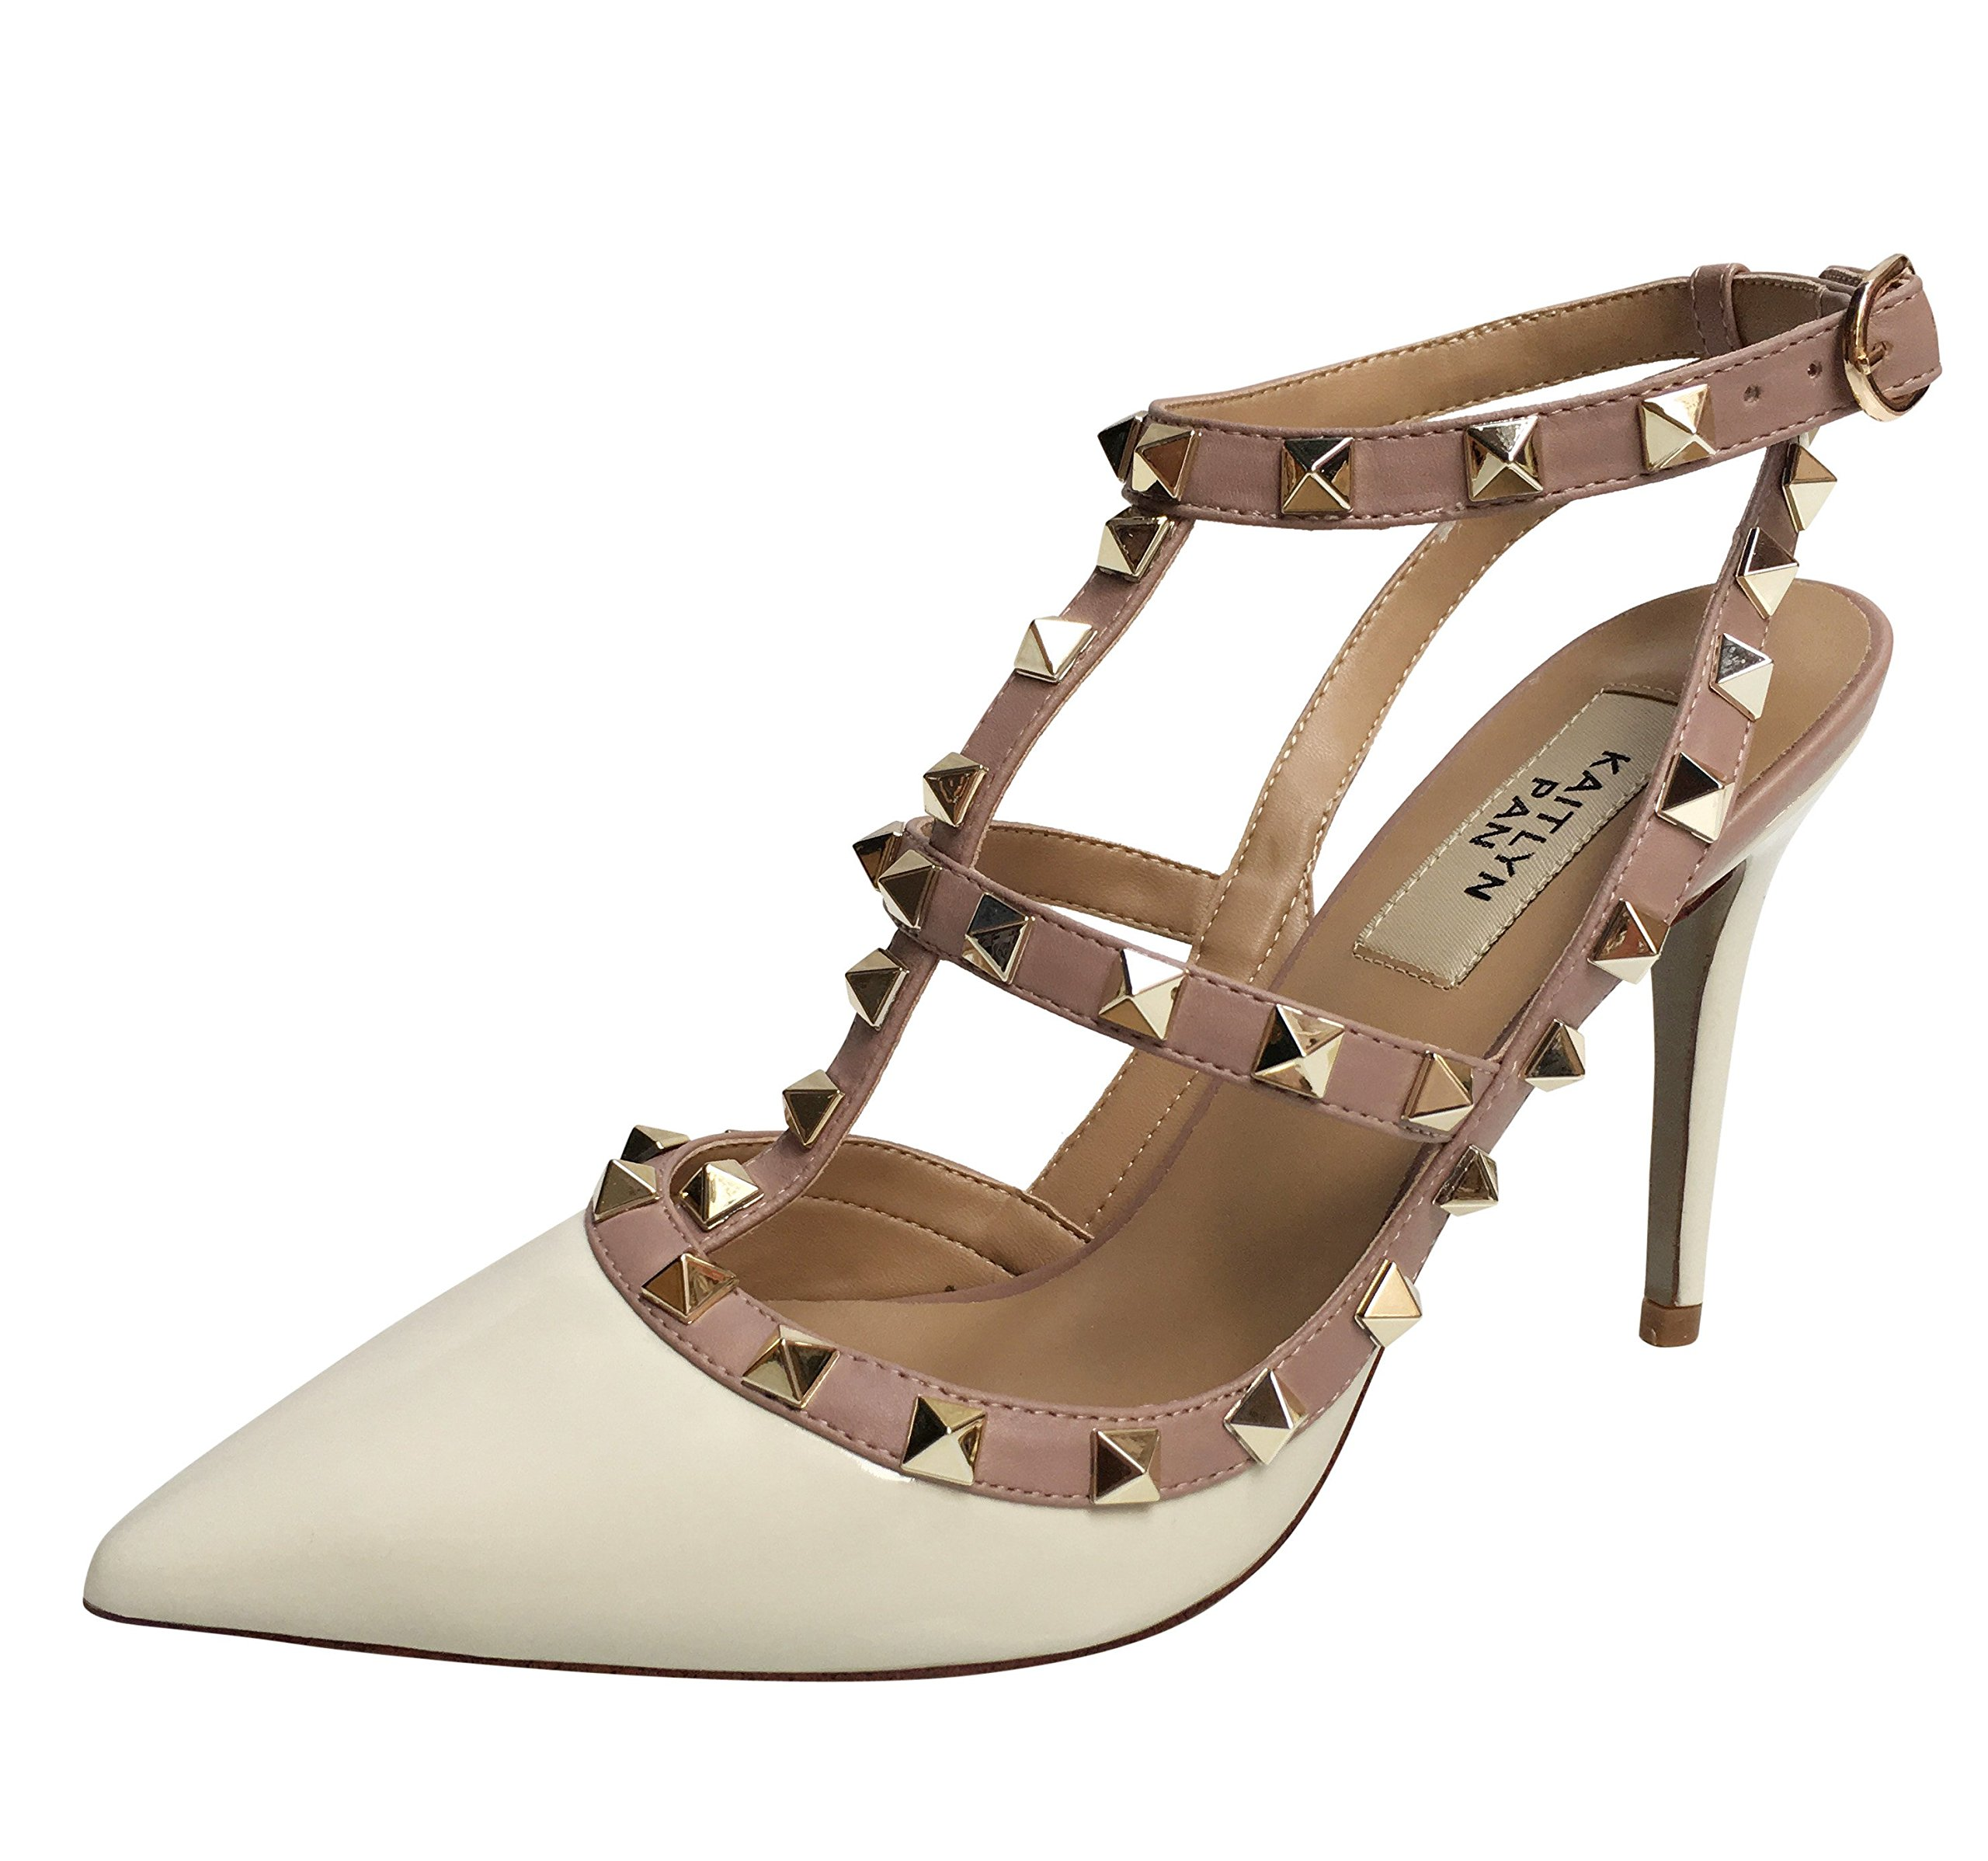 Kaitlyn Pan RockStud Slingback High Heel Leather Pumps